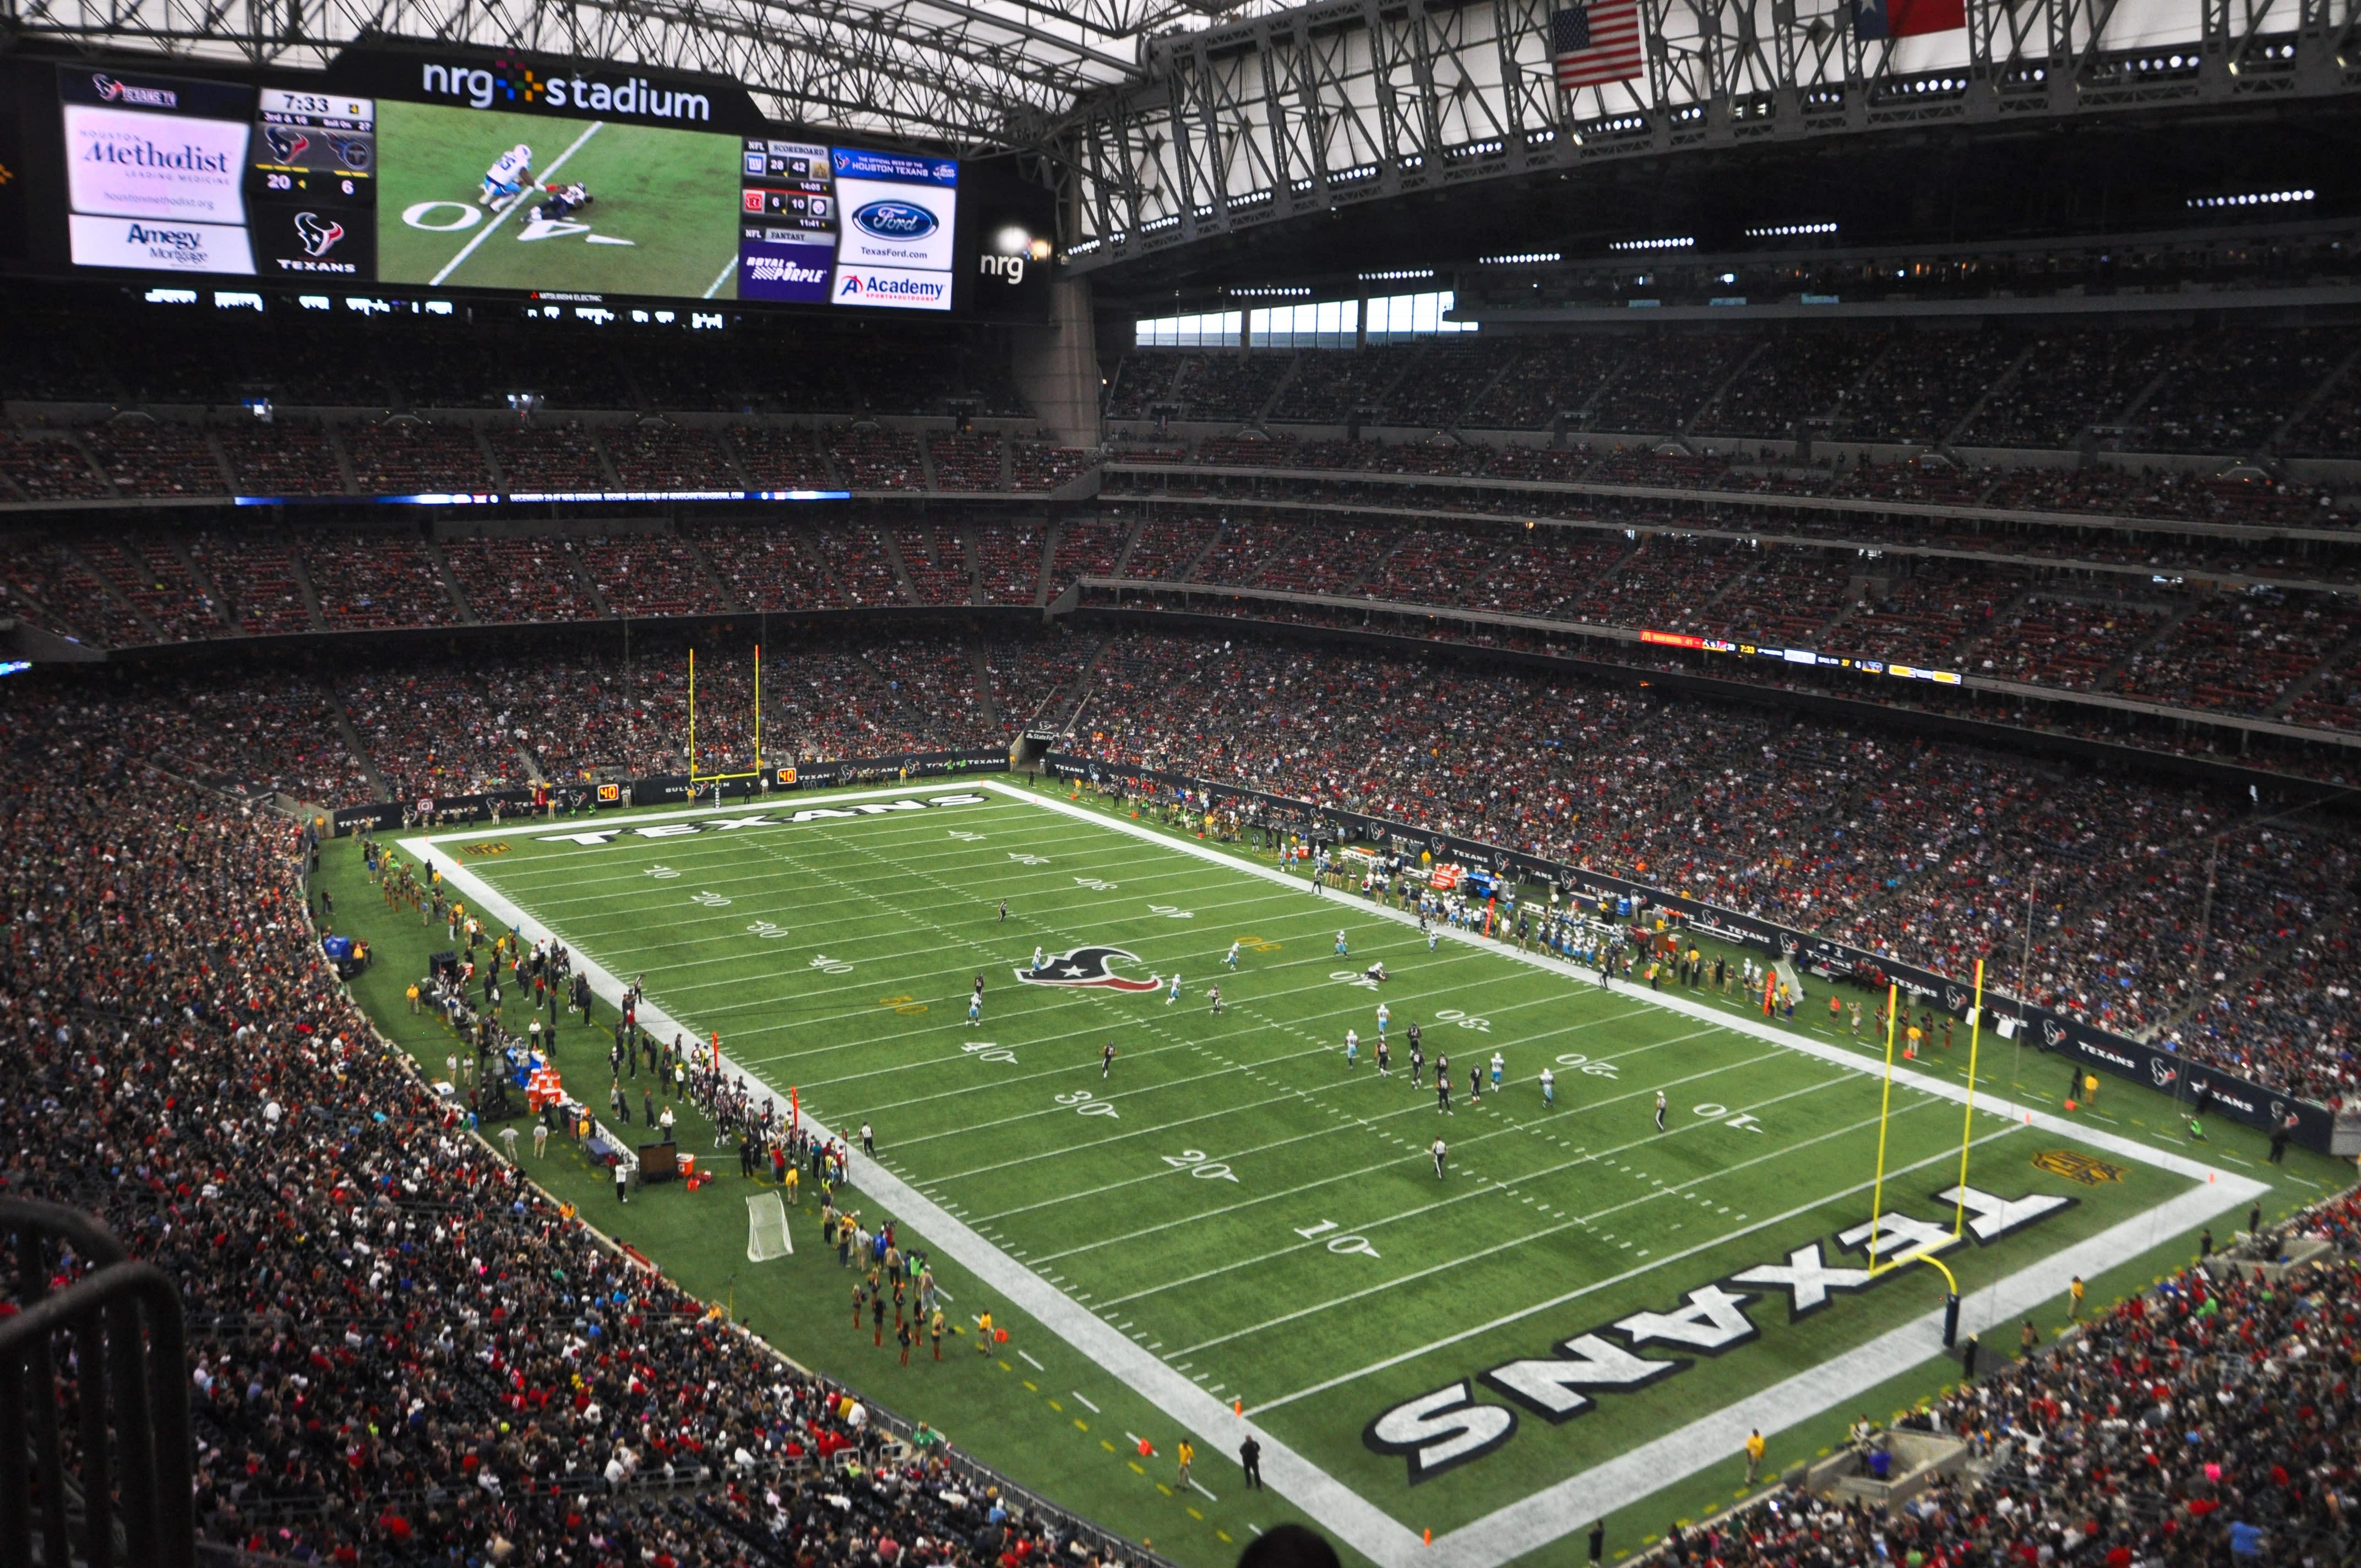 Houston's NRG Stadium